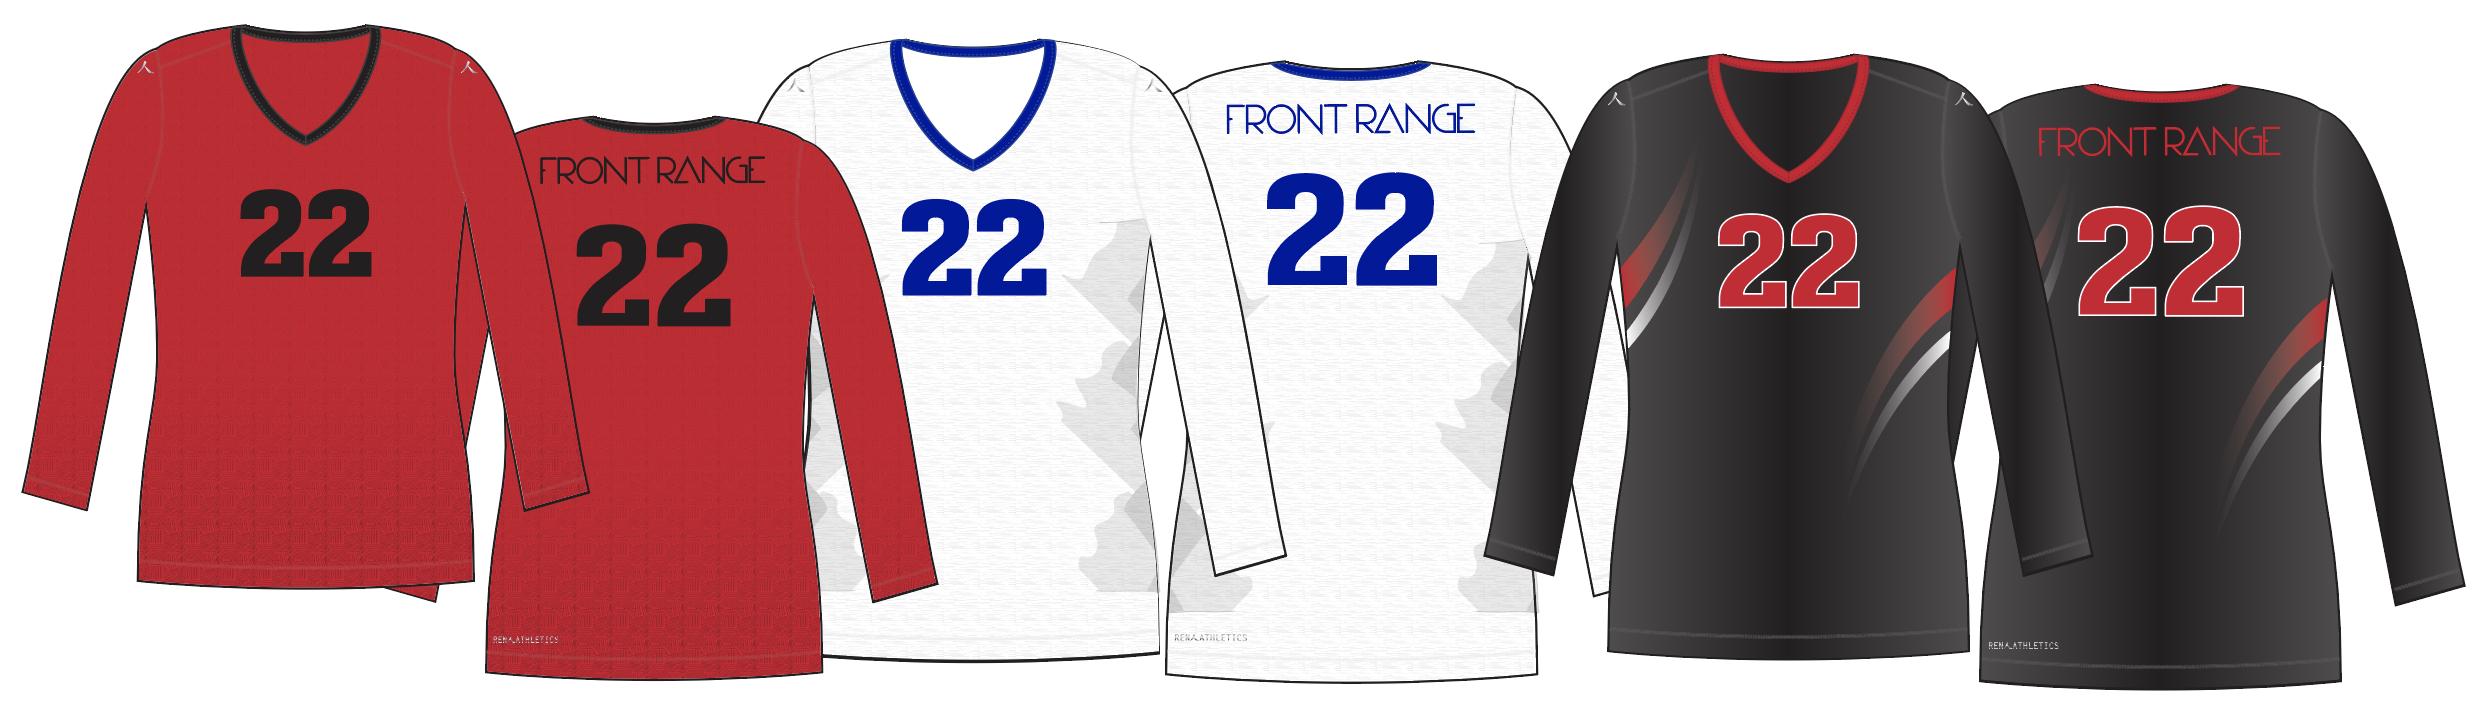 Front Range Custom Uniforms